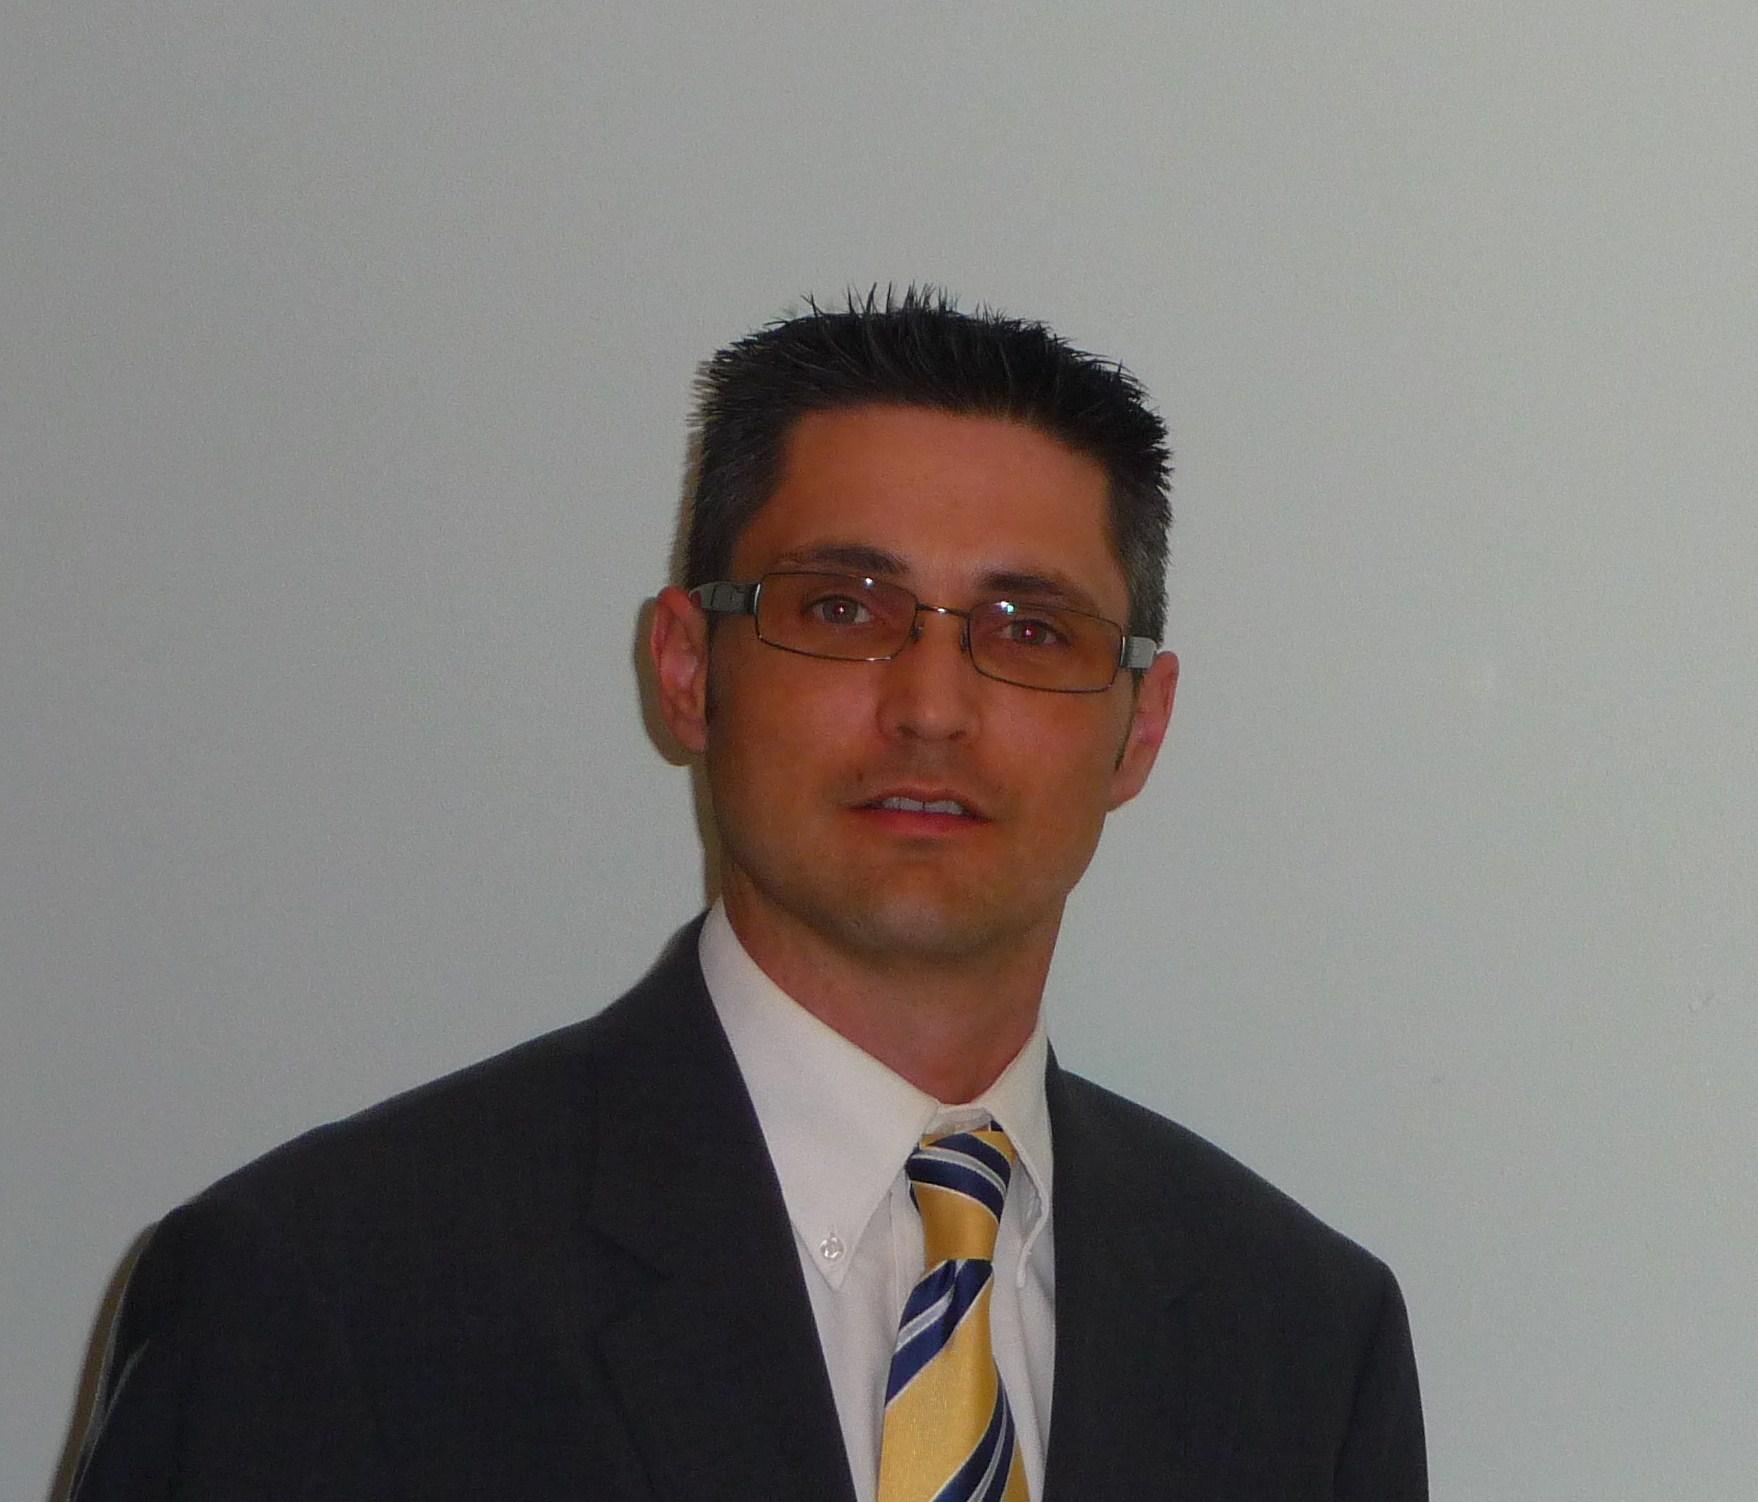 Jason Michael Thompson